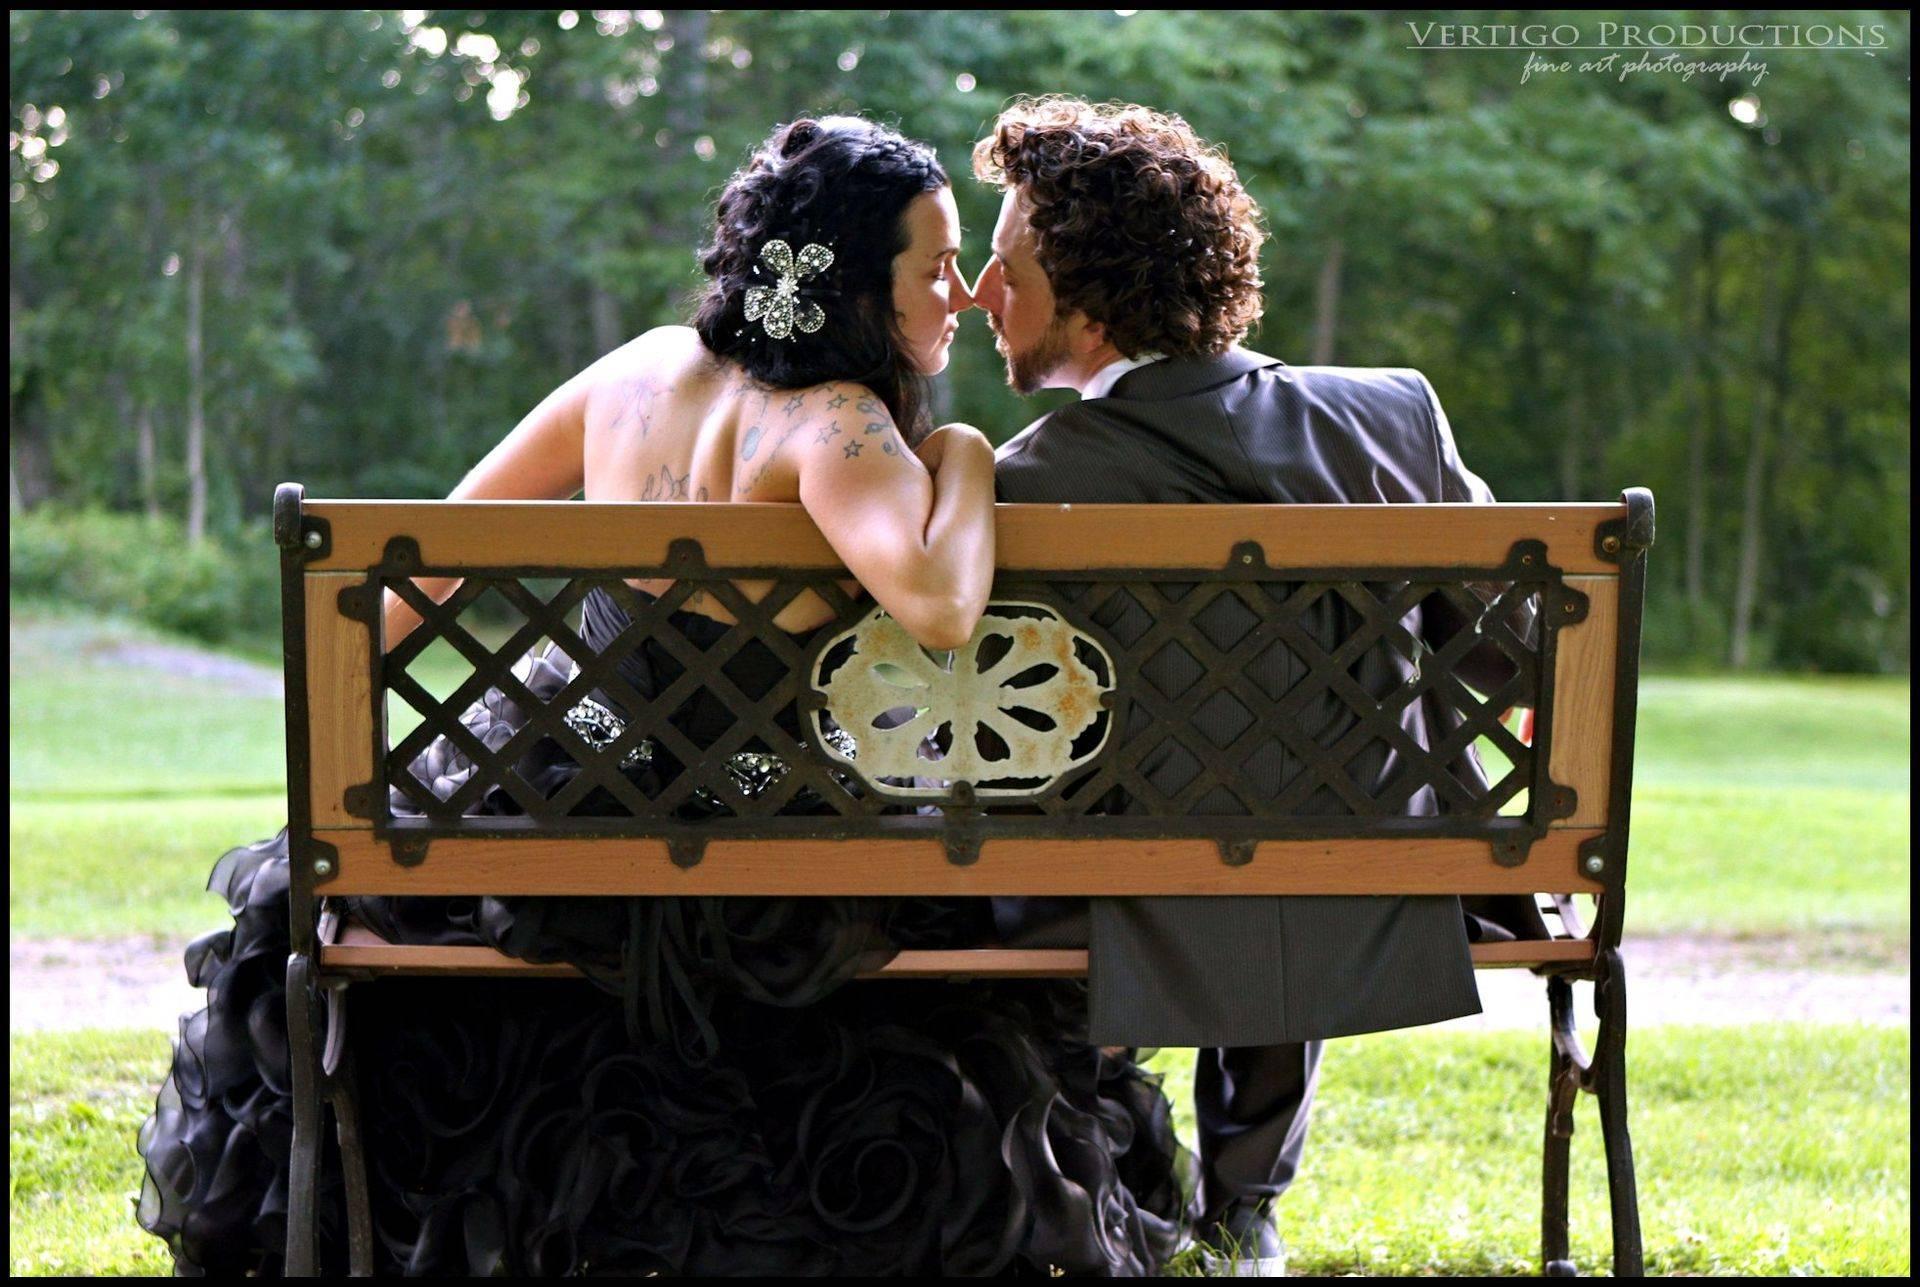 brockville wedding photographer, Brockville country club, vertigo productions photography